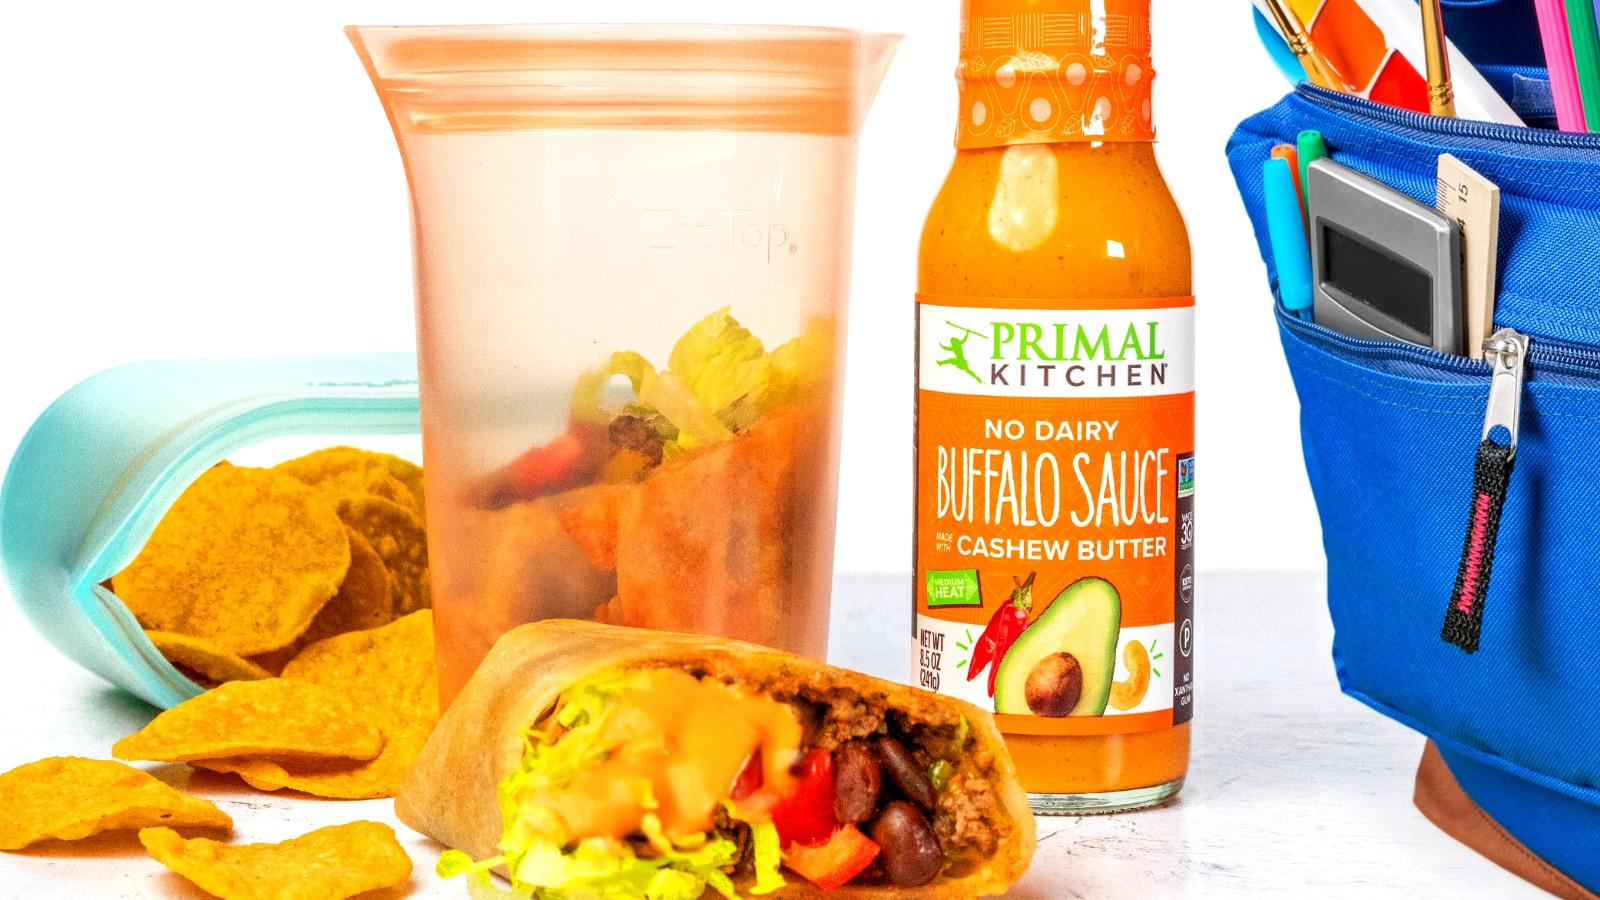 Image of Beef Burrito with Buffalo Sauce